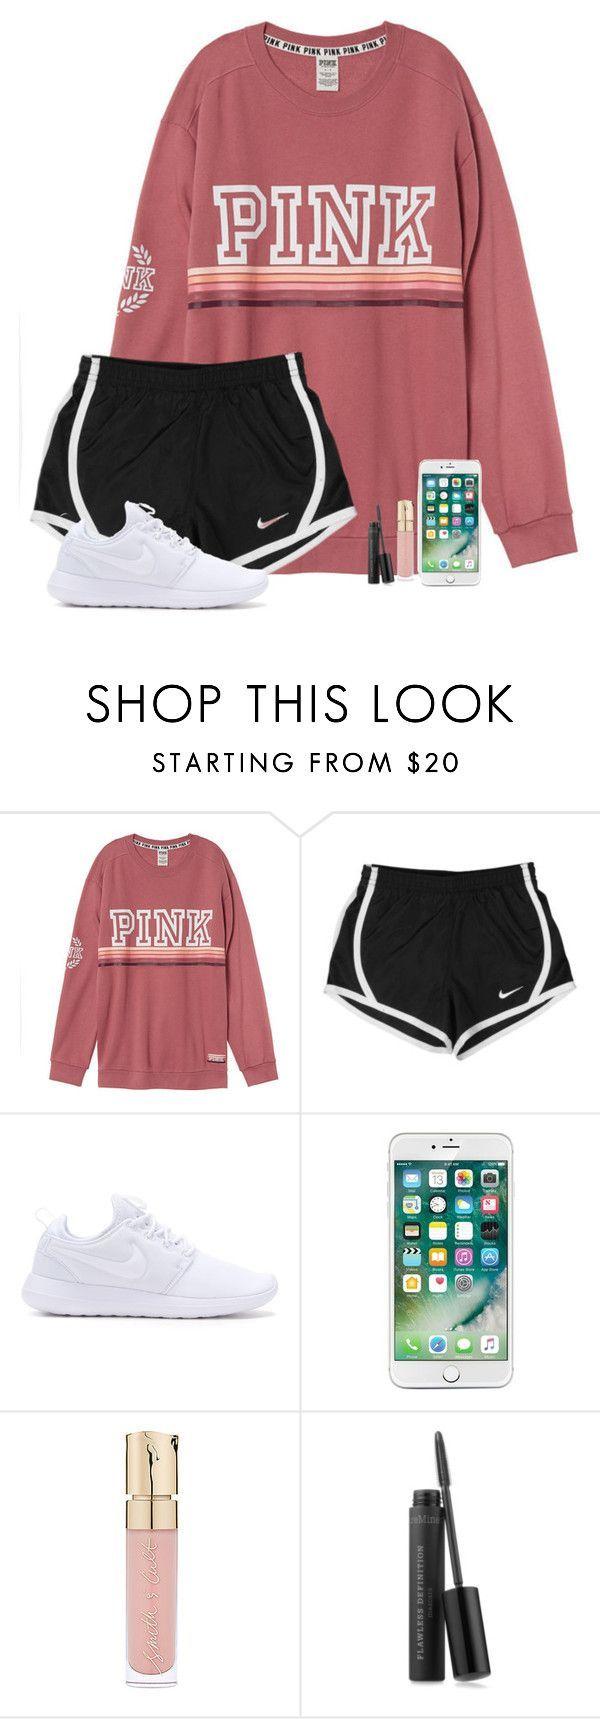 How to Dress Sporty to School